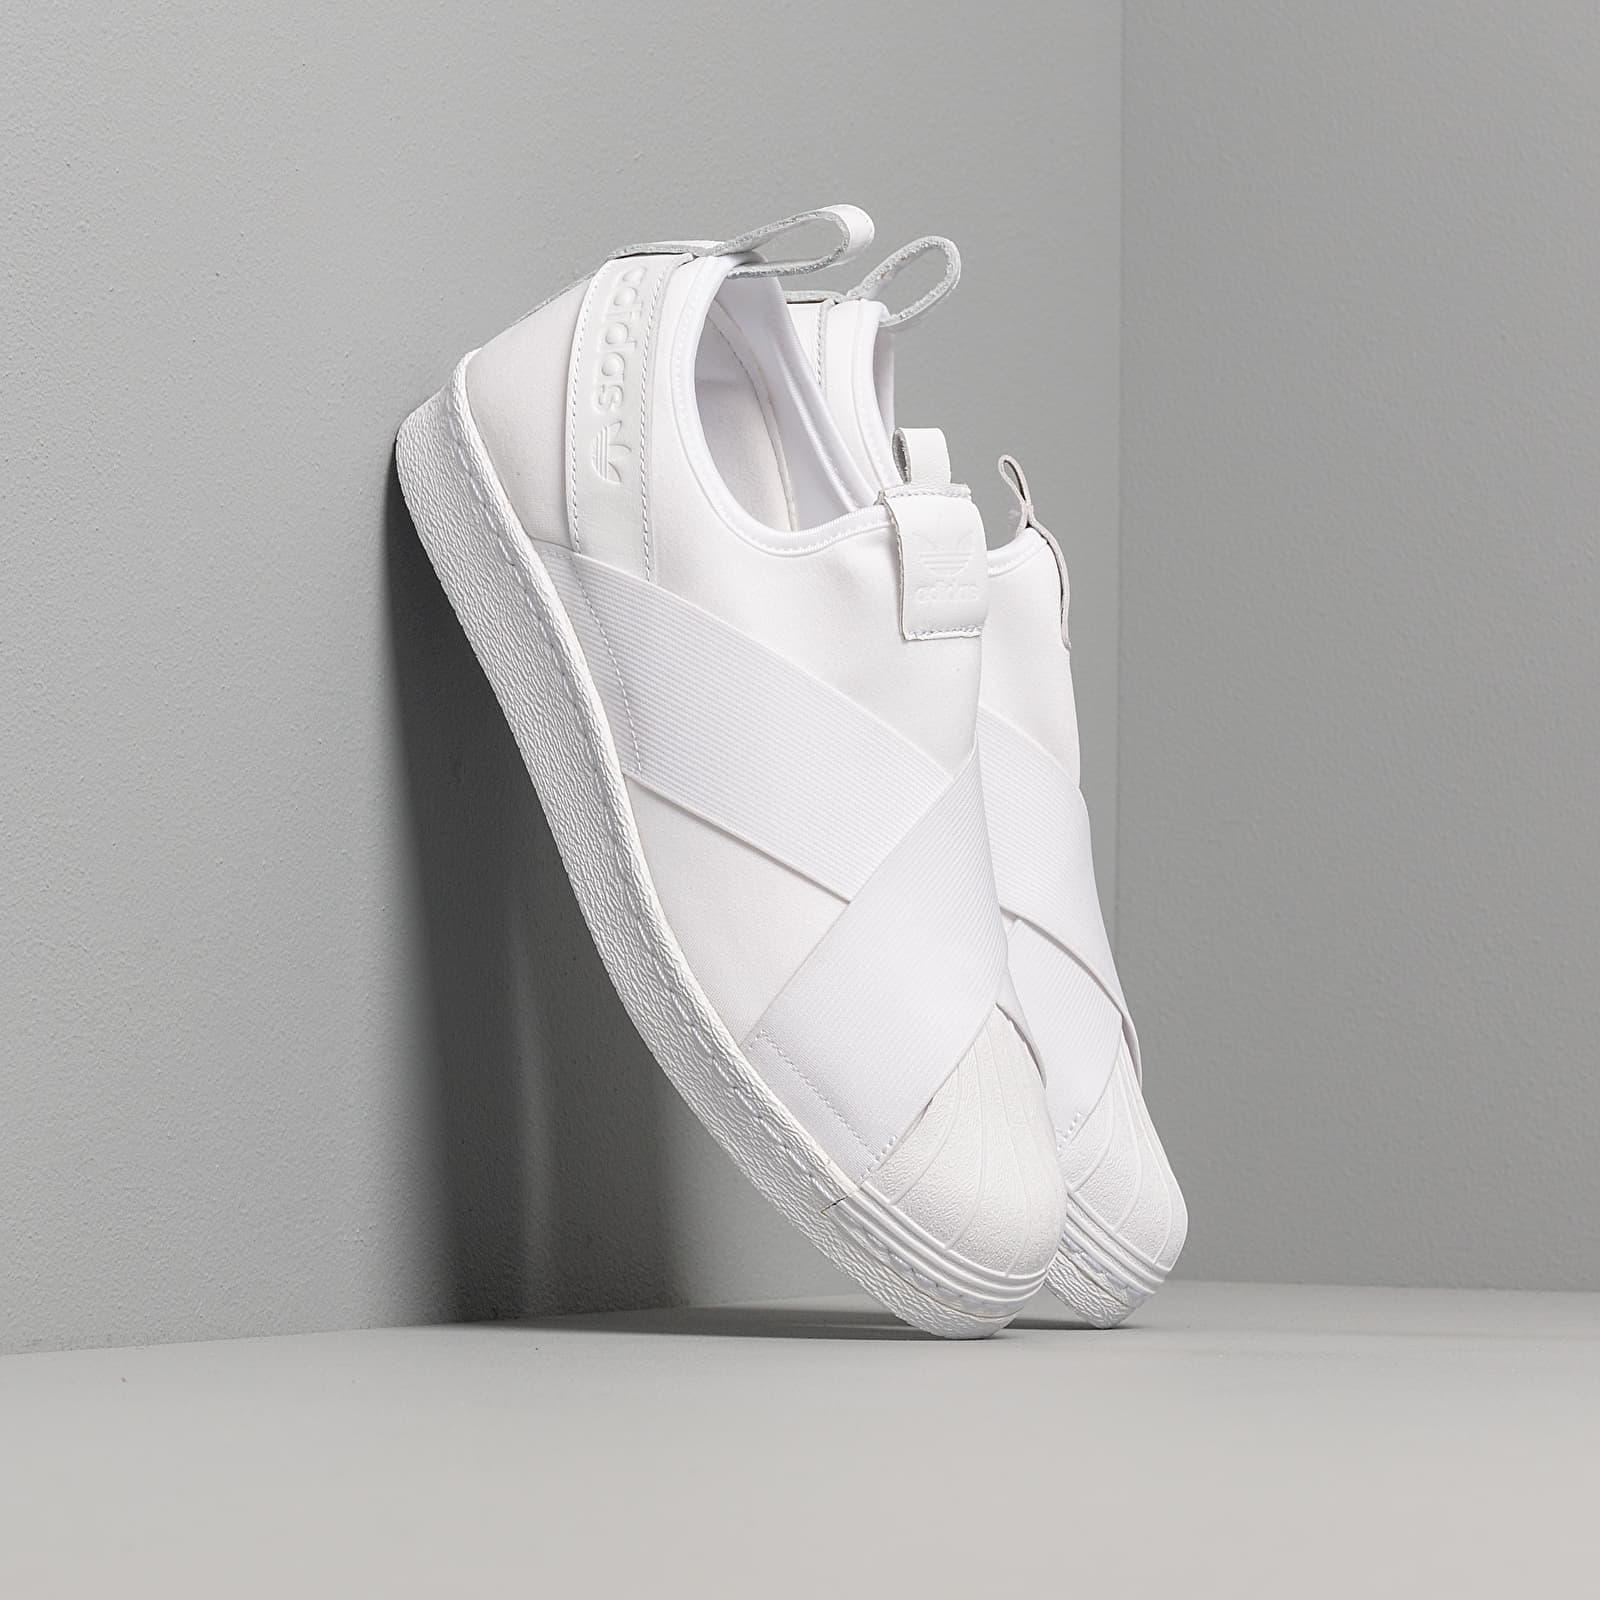 Scarpe e sneaker da uomo adidas Superstar Slip On Ftw White/ Ftw White/ Ftw White